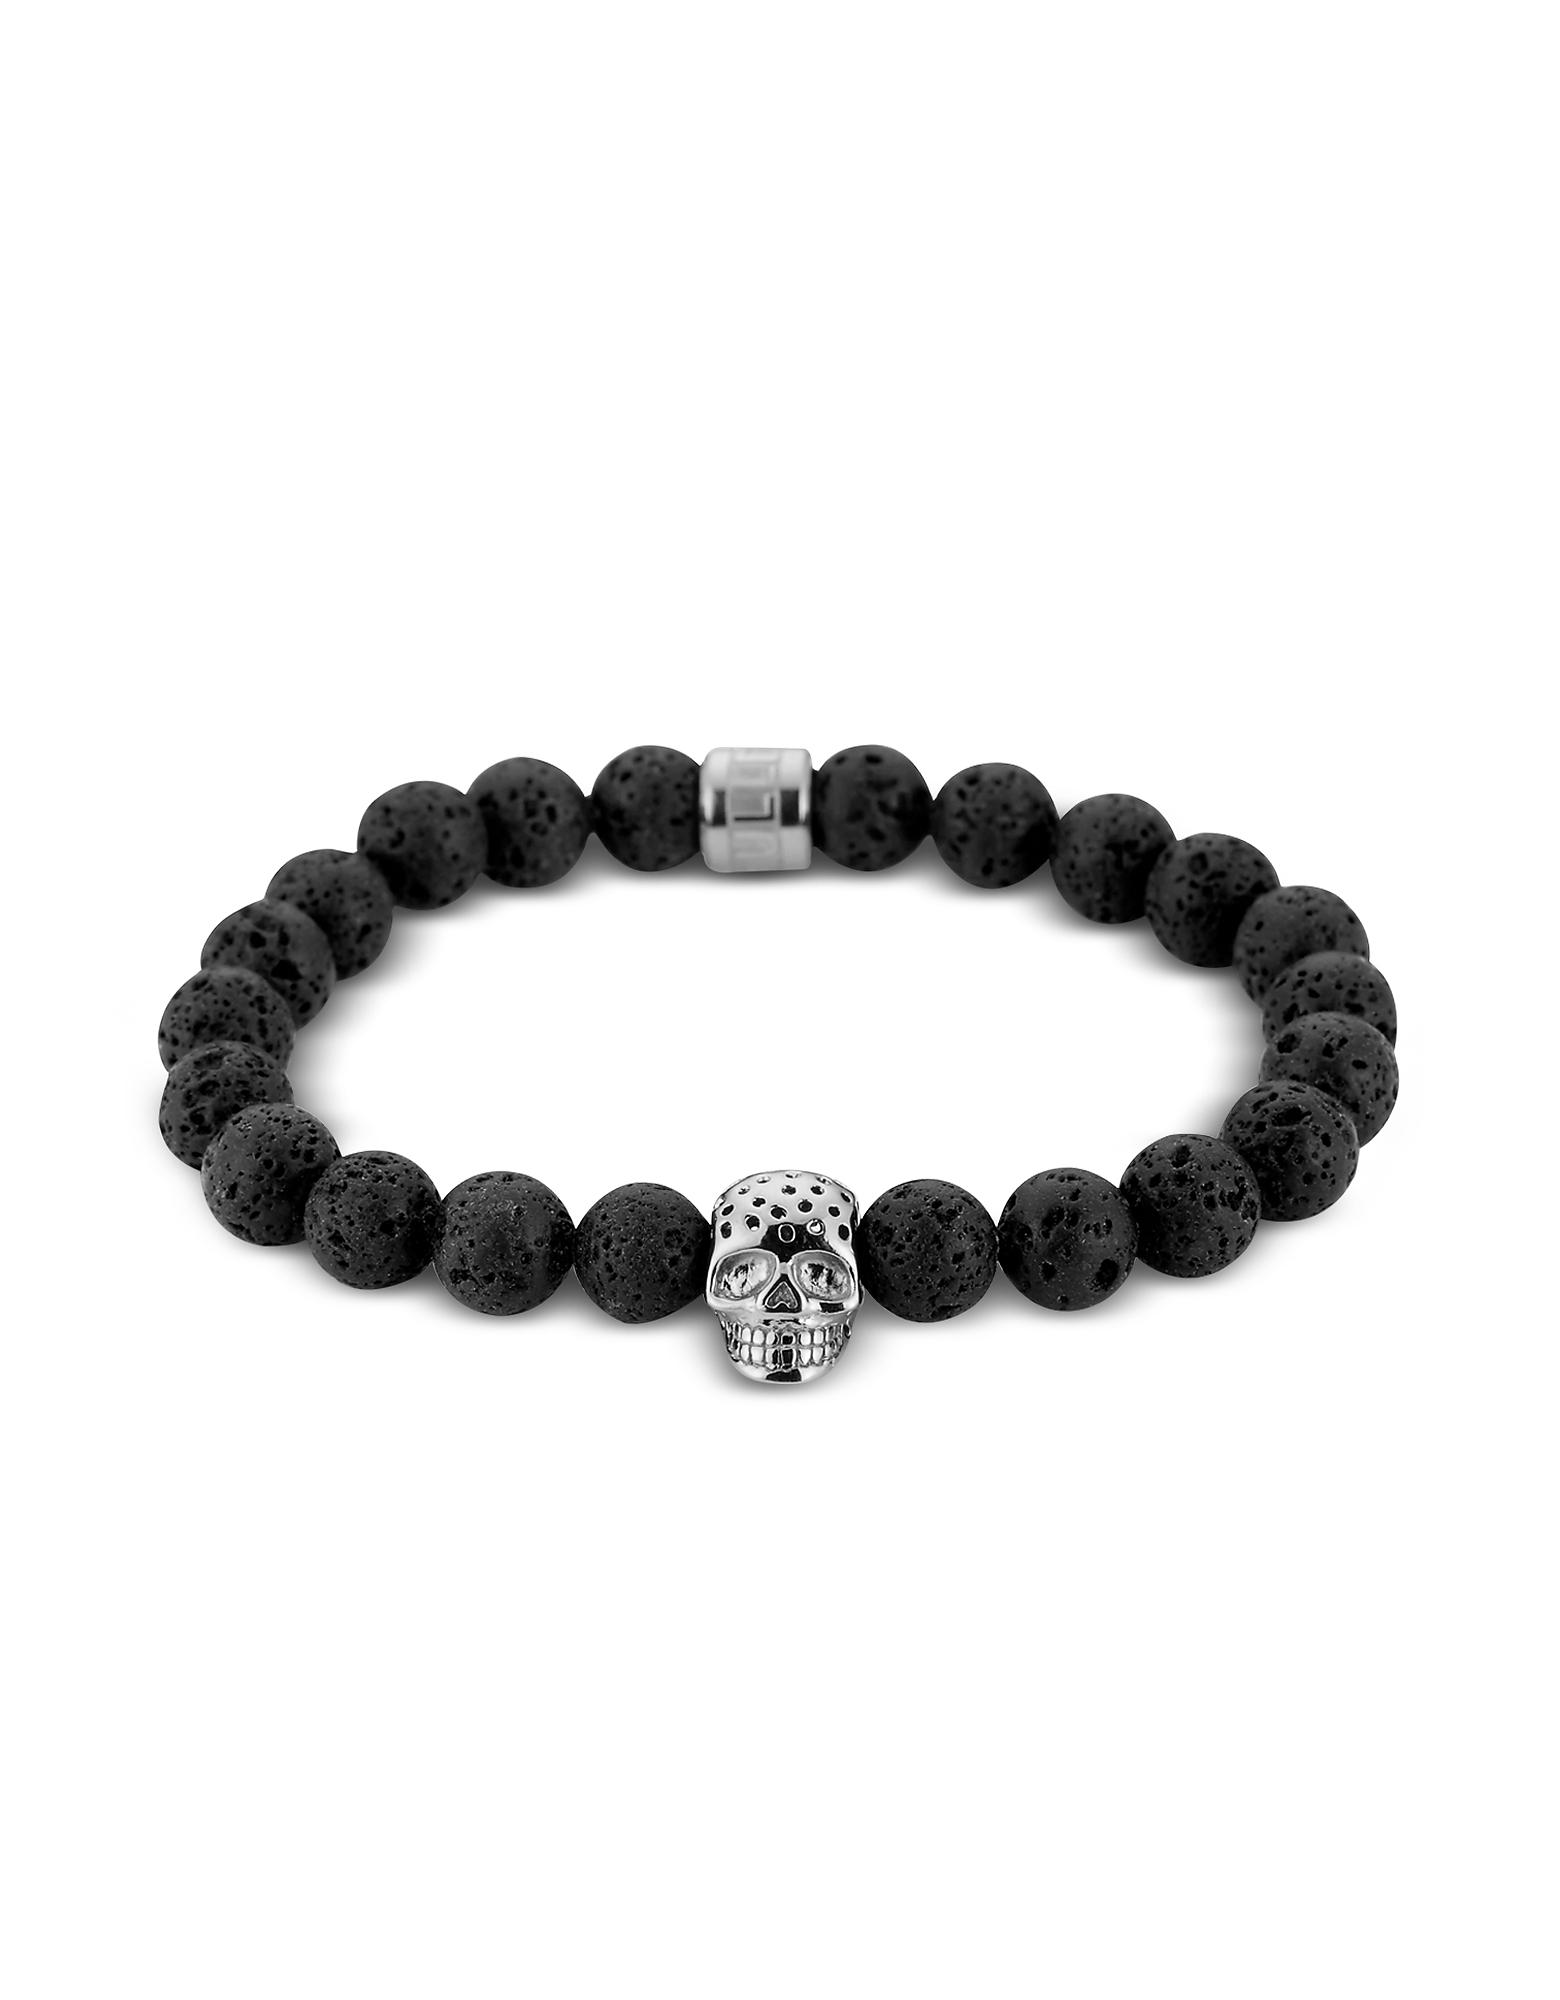 Lavastone & Perforated Silver Skull Charm Bracelet, Black